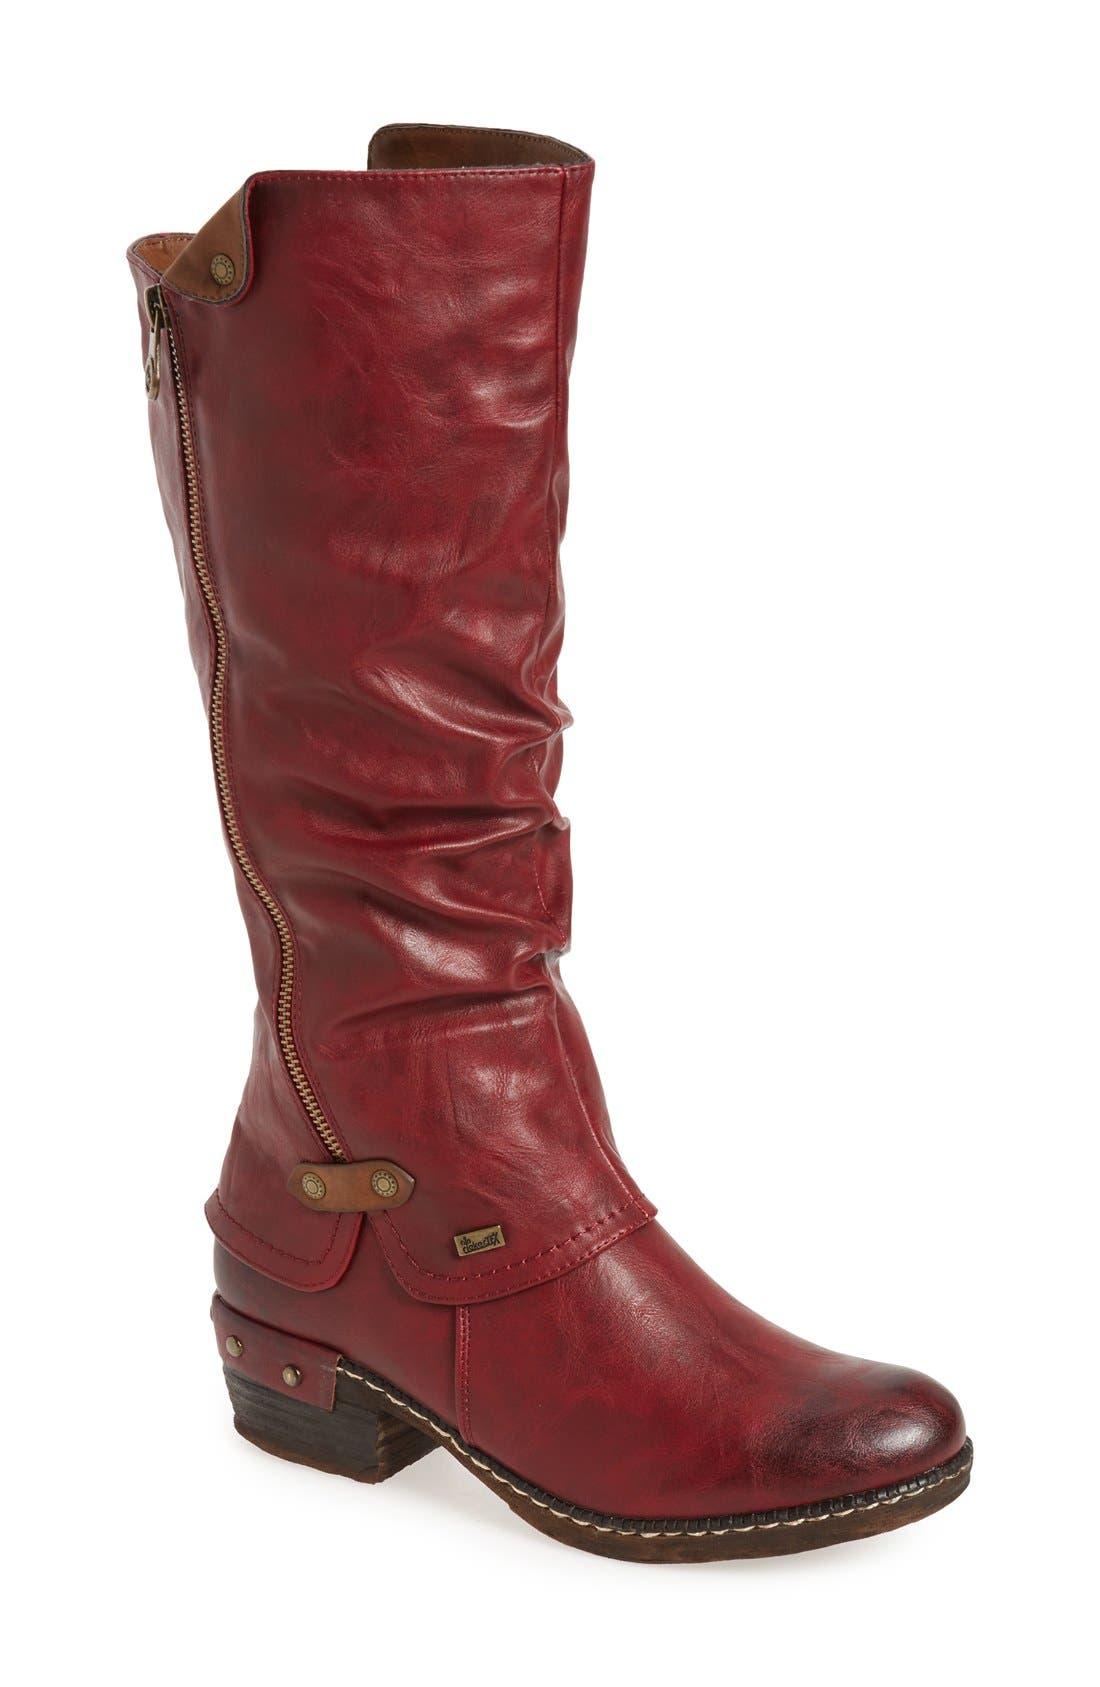 Main Image - Rieker Antistress 'Bernadette 55' Slightly Slouchy All Weather Boot (Women)